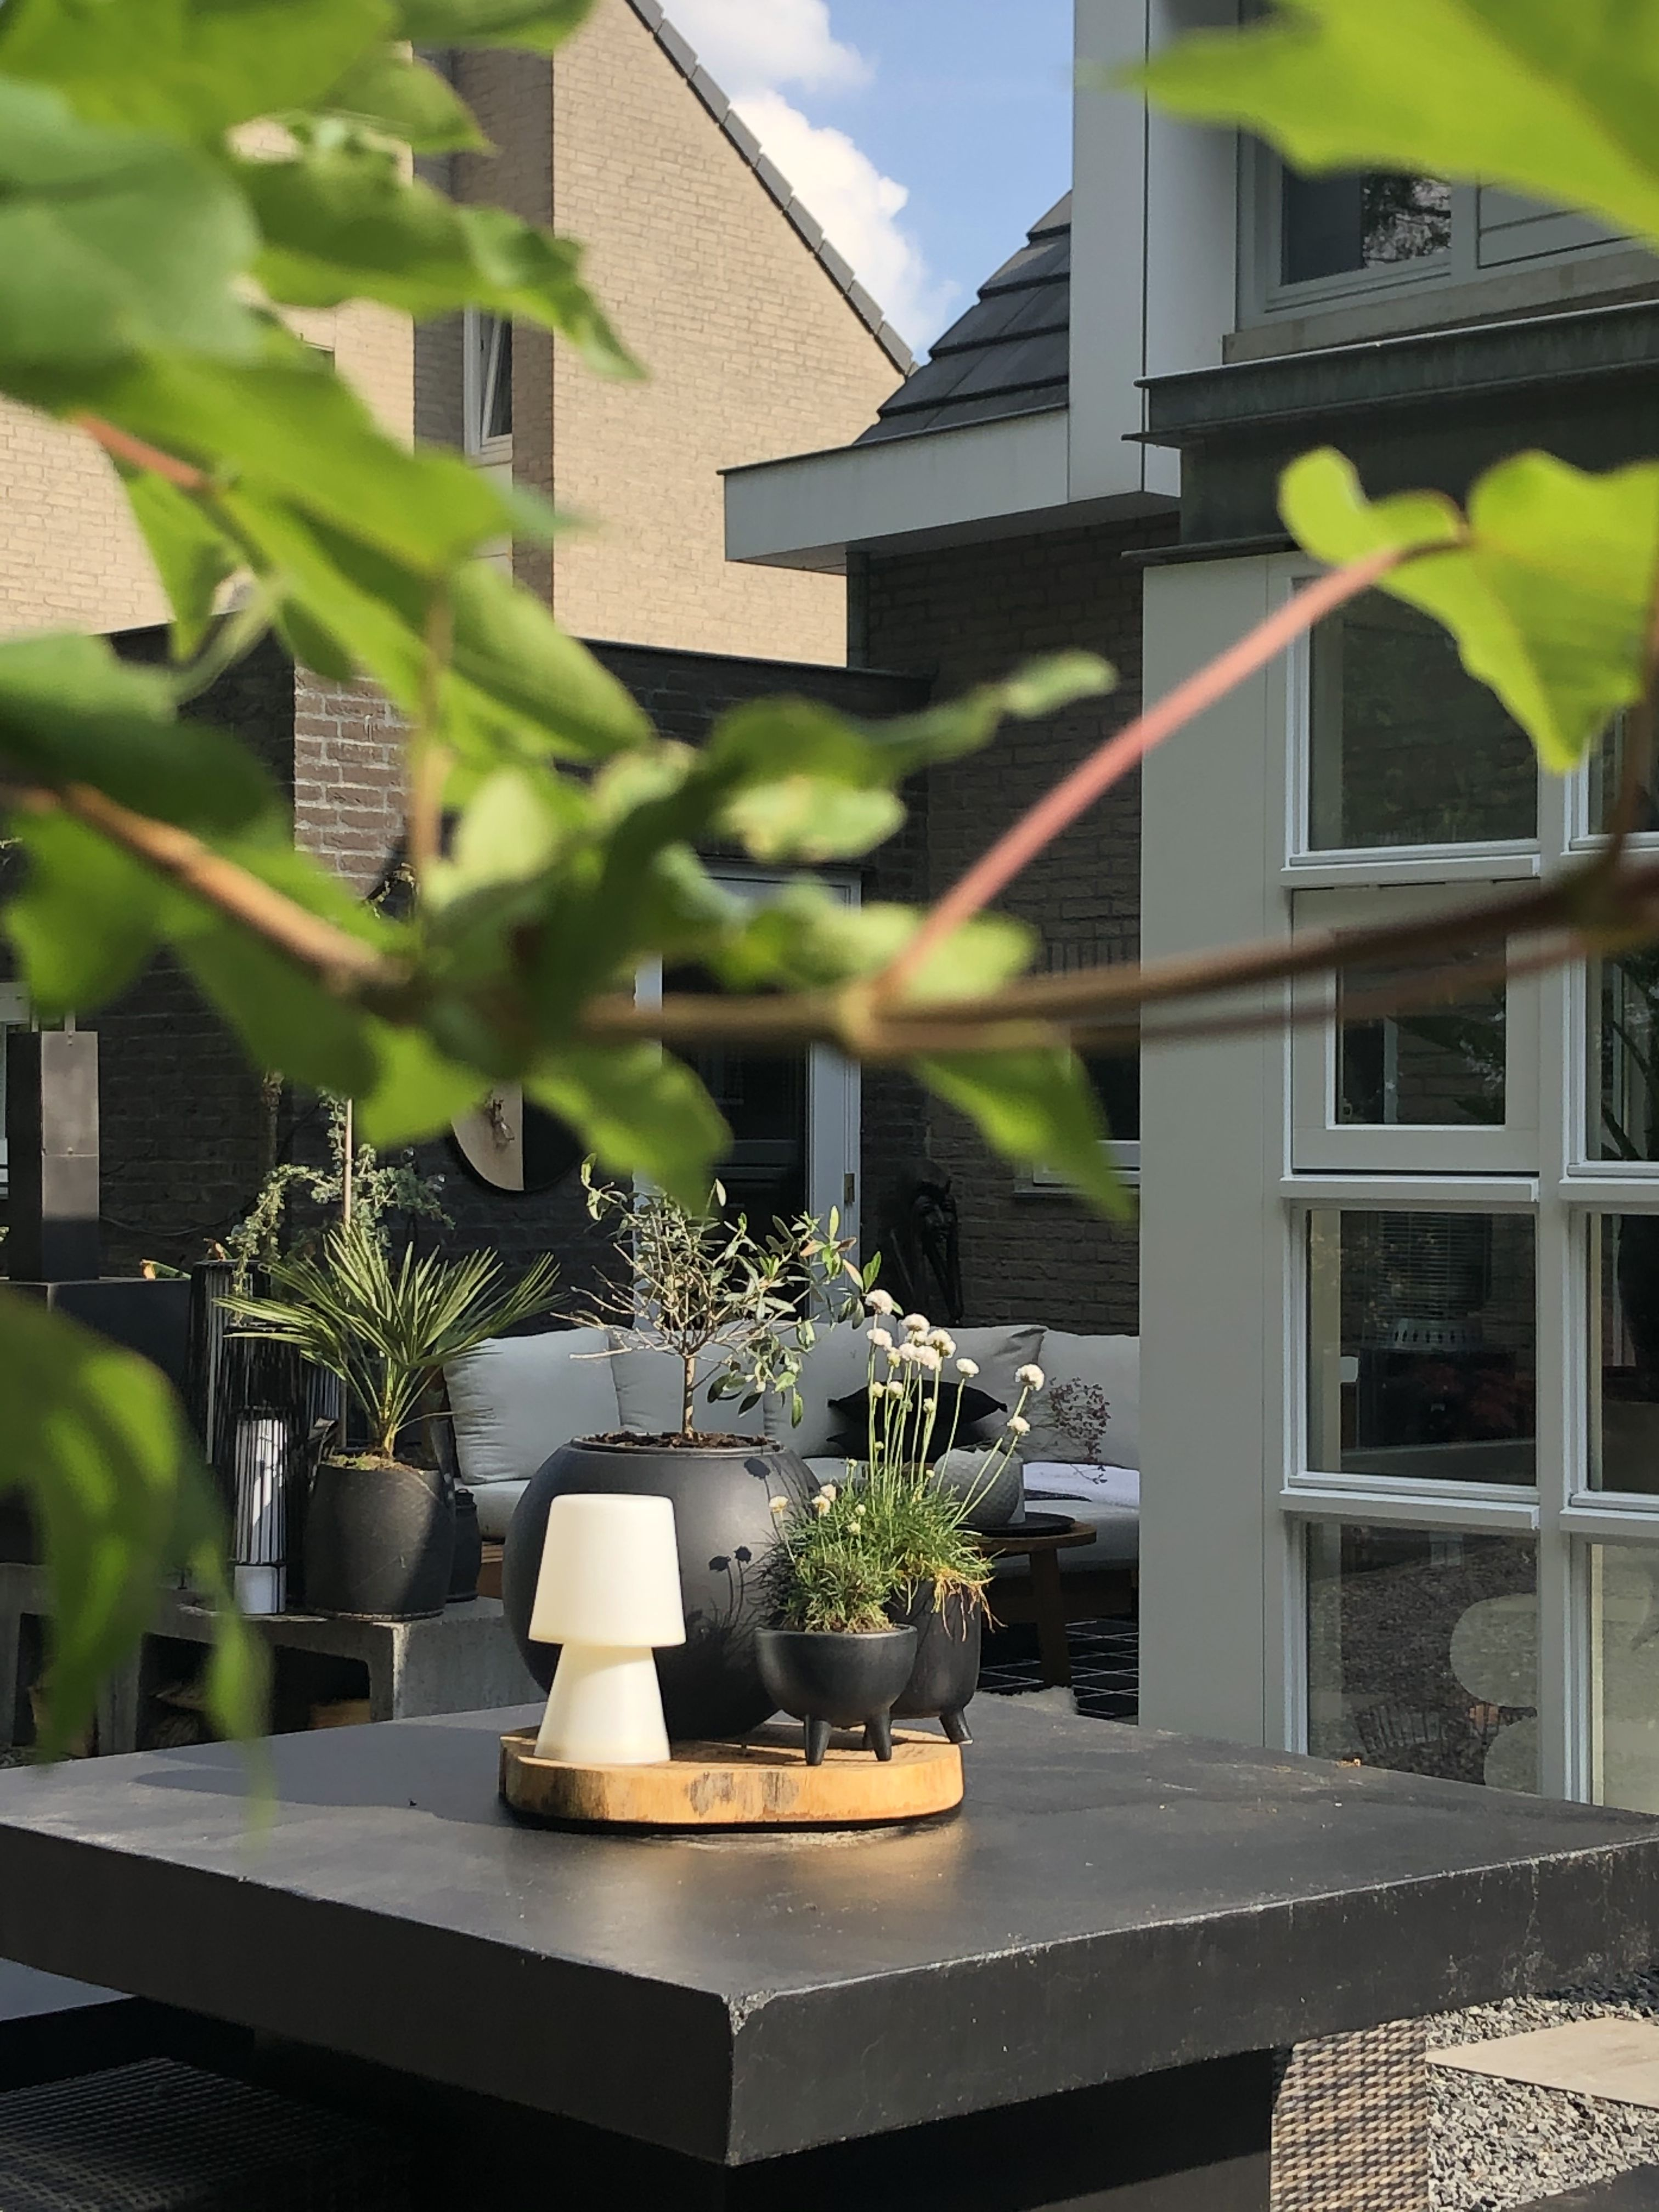 #garden #tuin #tuininspiratie #tuindecoratie #gardendecoration #gardeninspiration